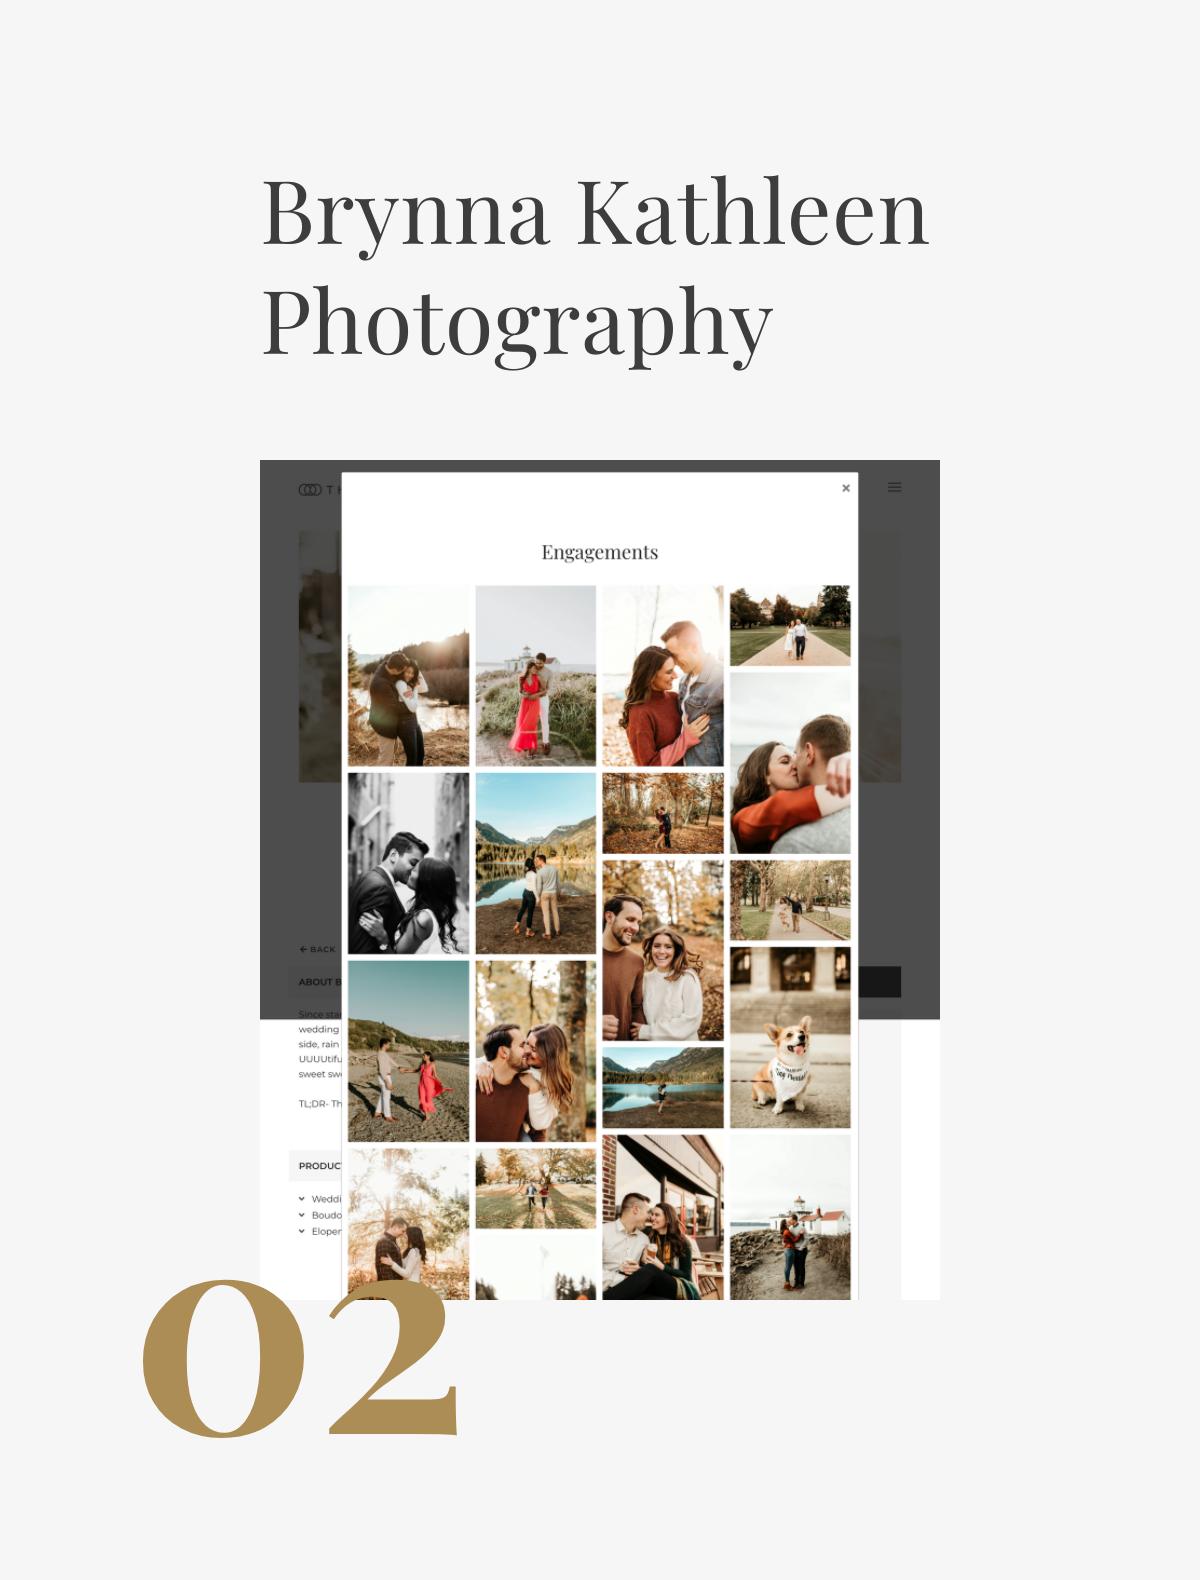 Brynna Kathleen Photography